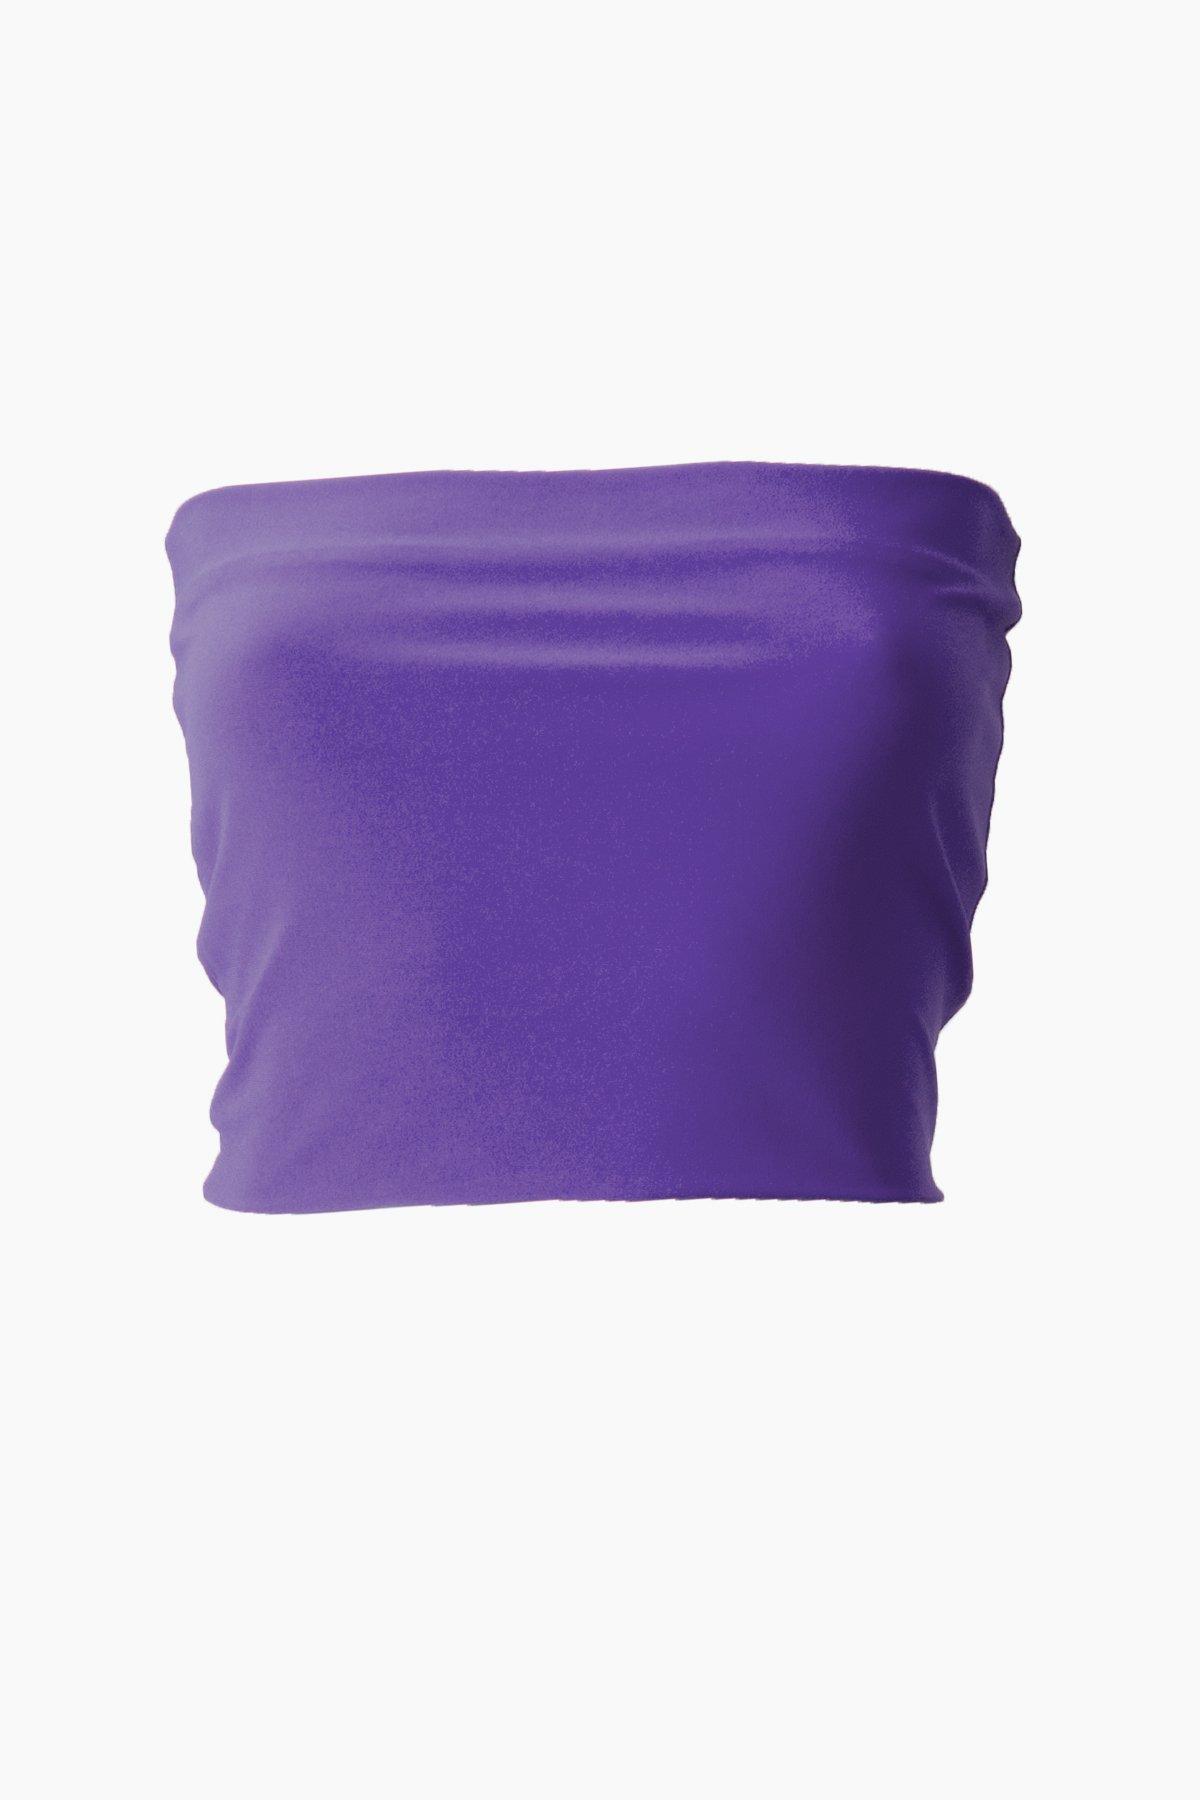 purple tube top - Google Search